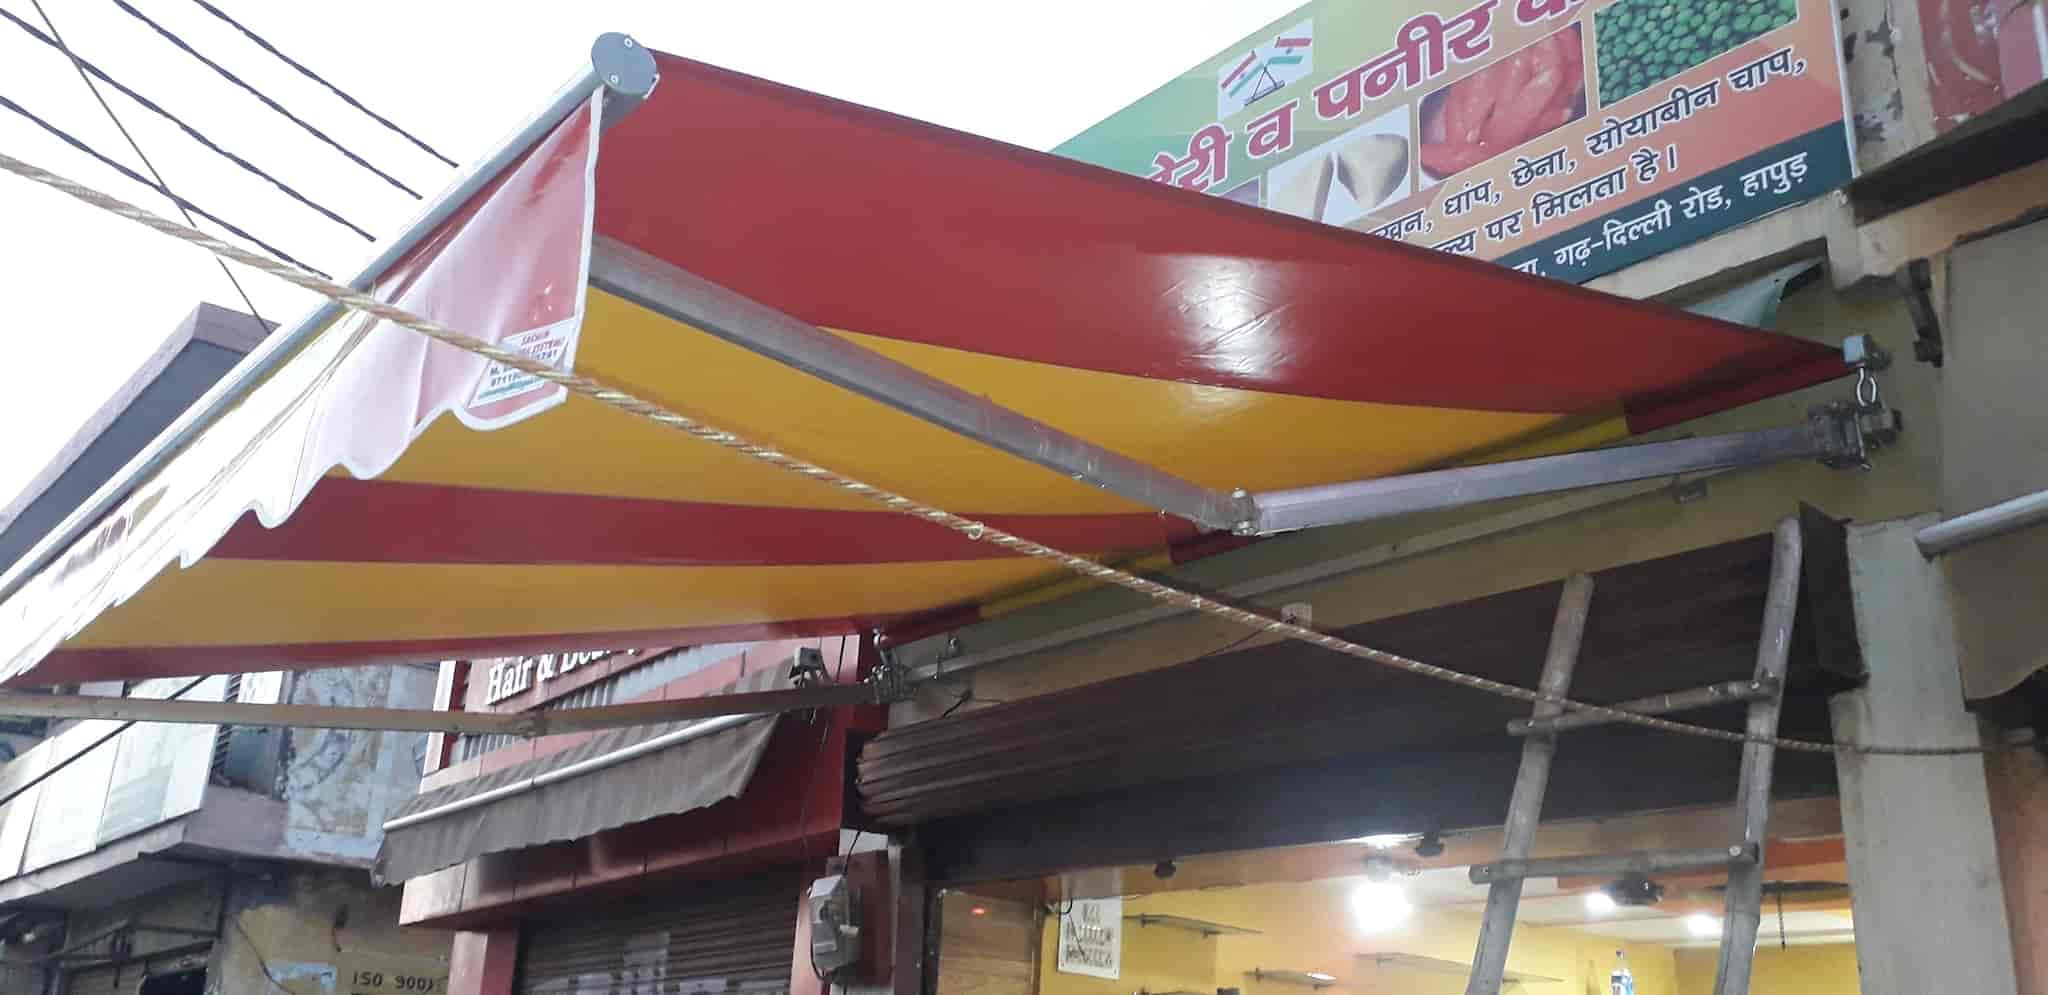 Sachin Awning System, Burari - Awning Dealers in Delhi - Justdial